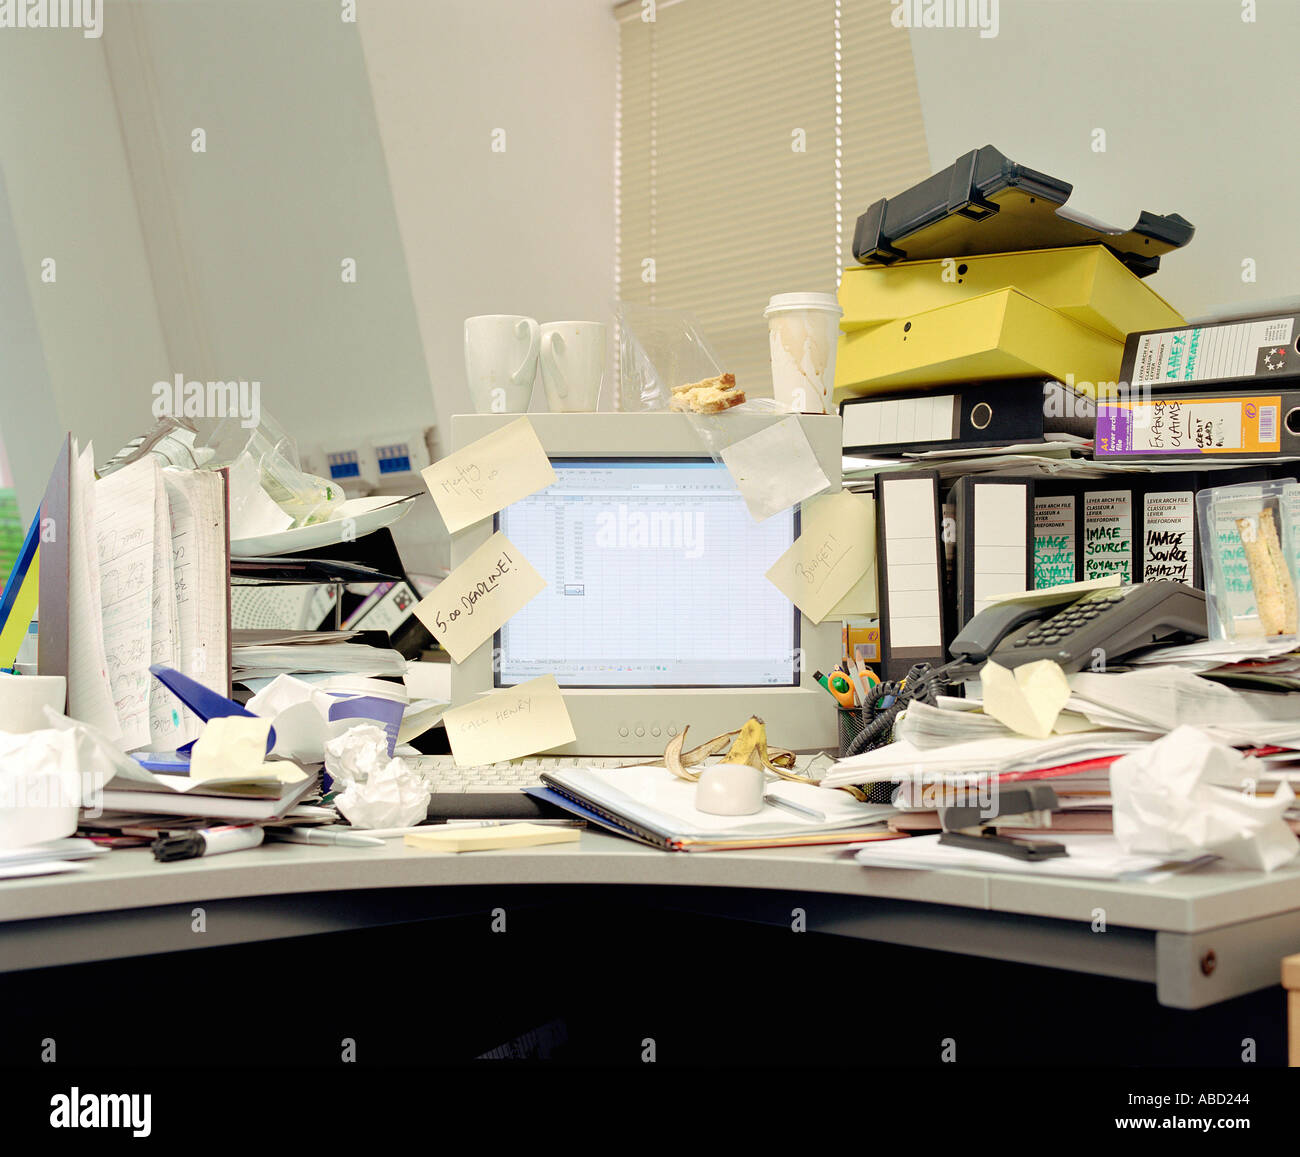 Messy office desk - Stock Image